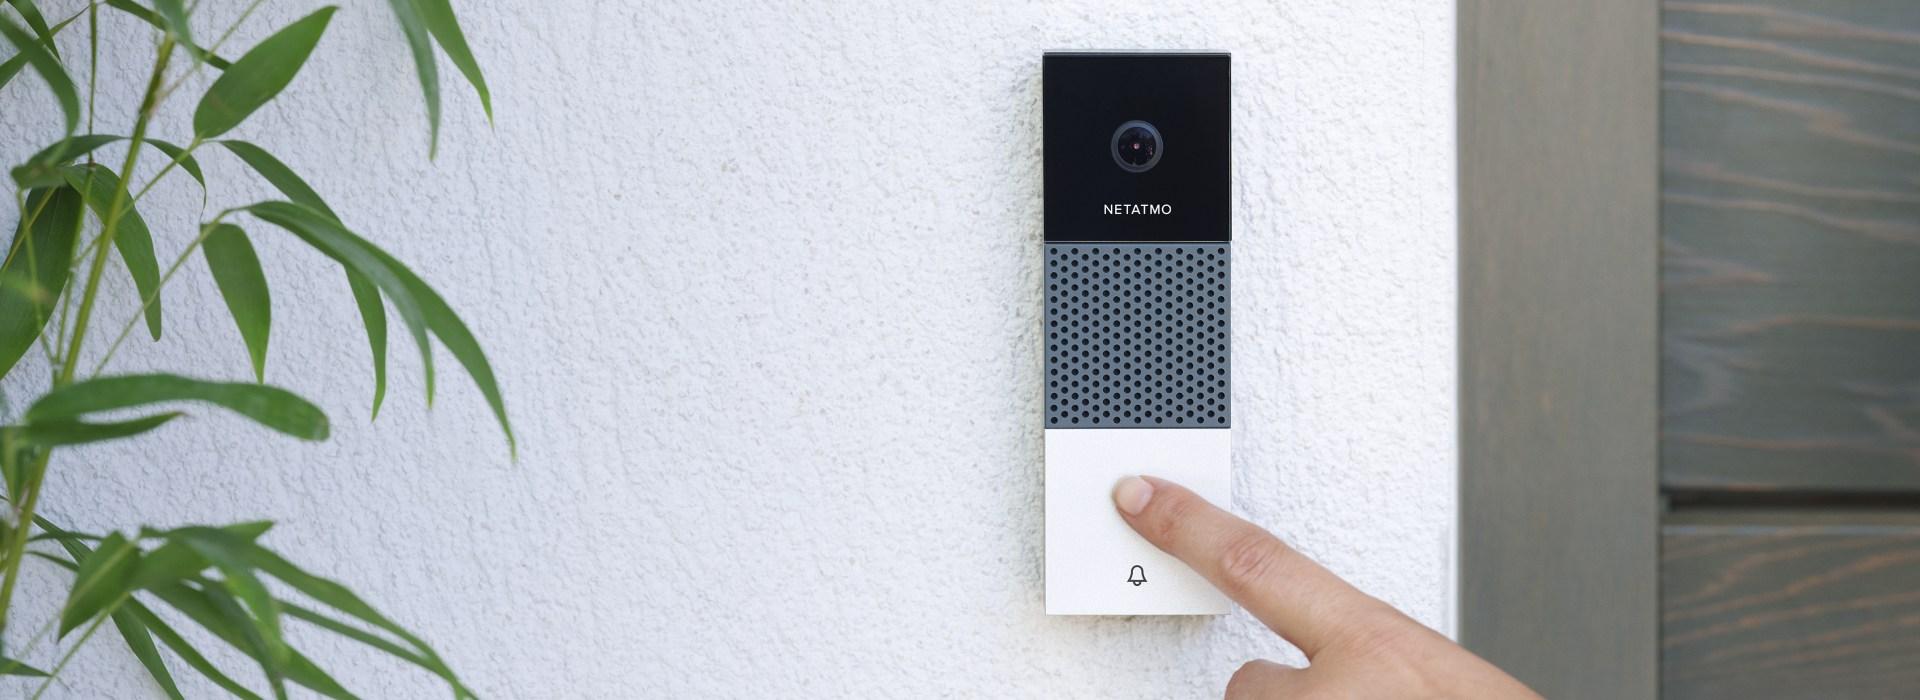 Netatmo Announces Nest Hello, Ring Doorbell Alternative